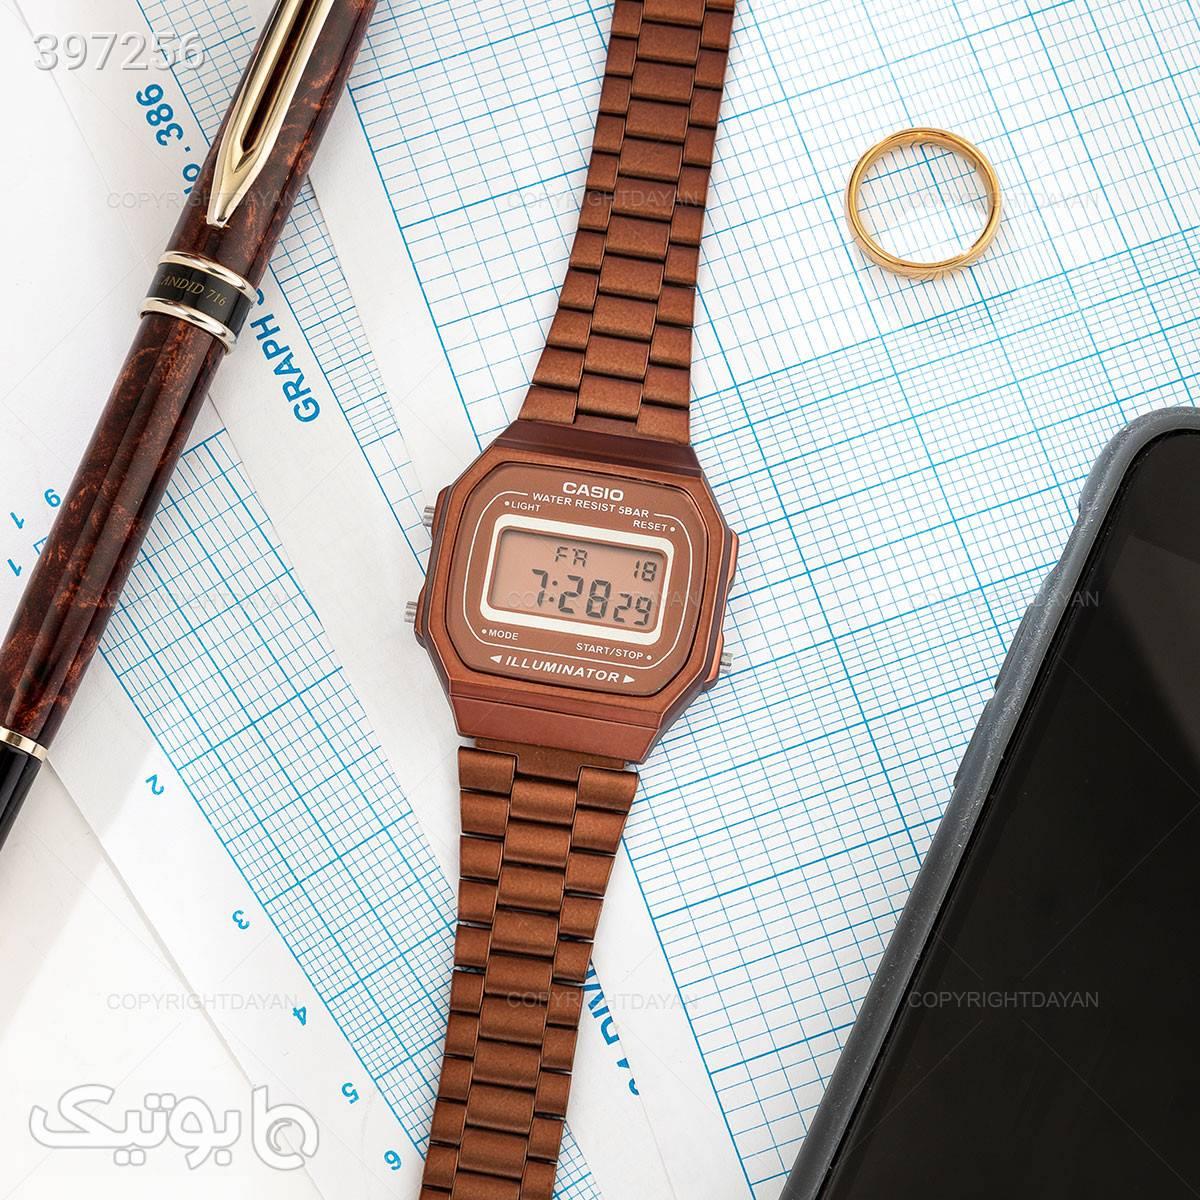 ساعت مچی Casio مدل 12530 نارنجی ساعت